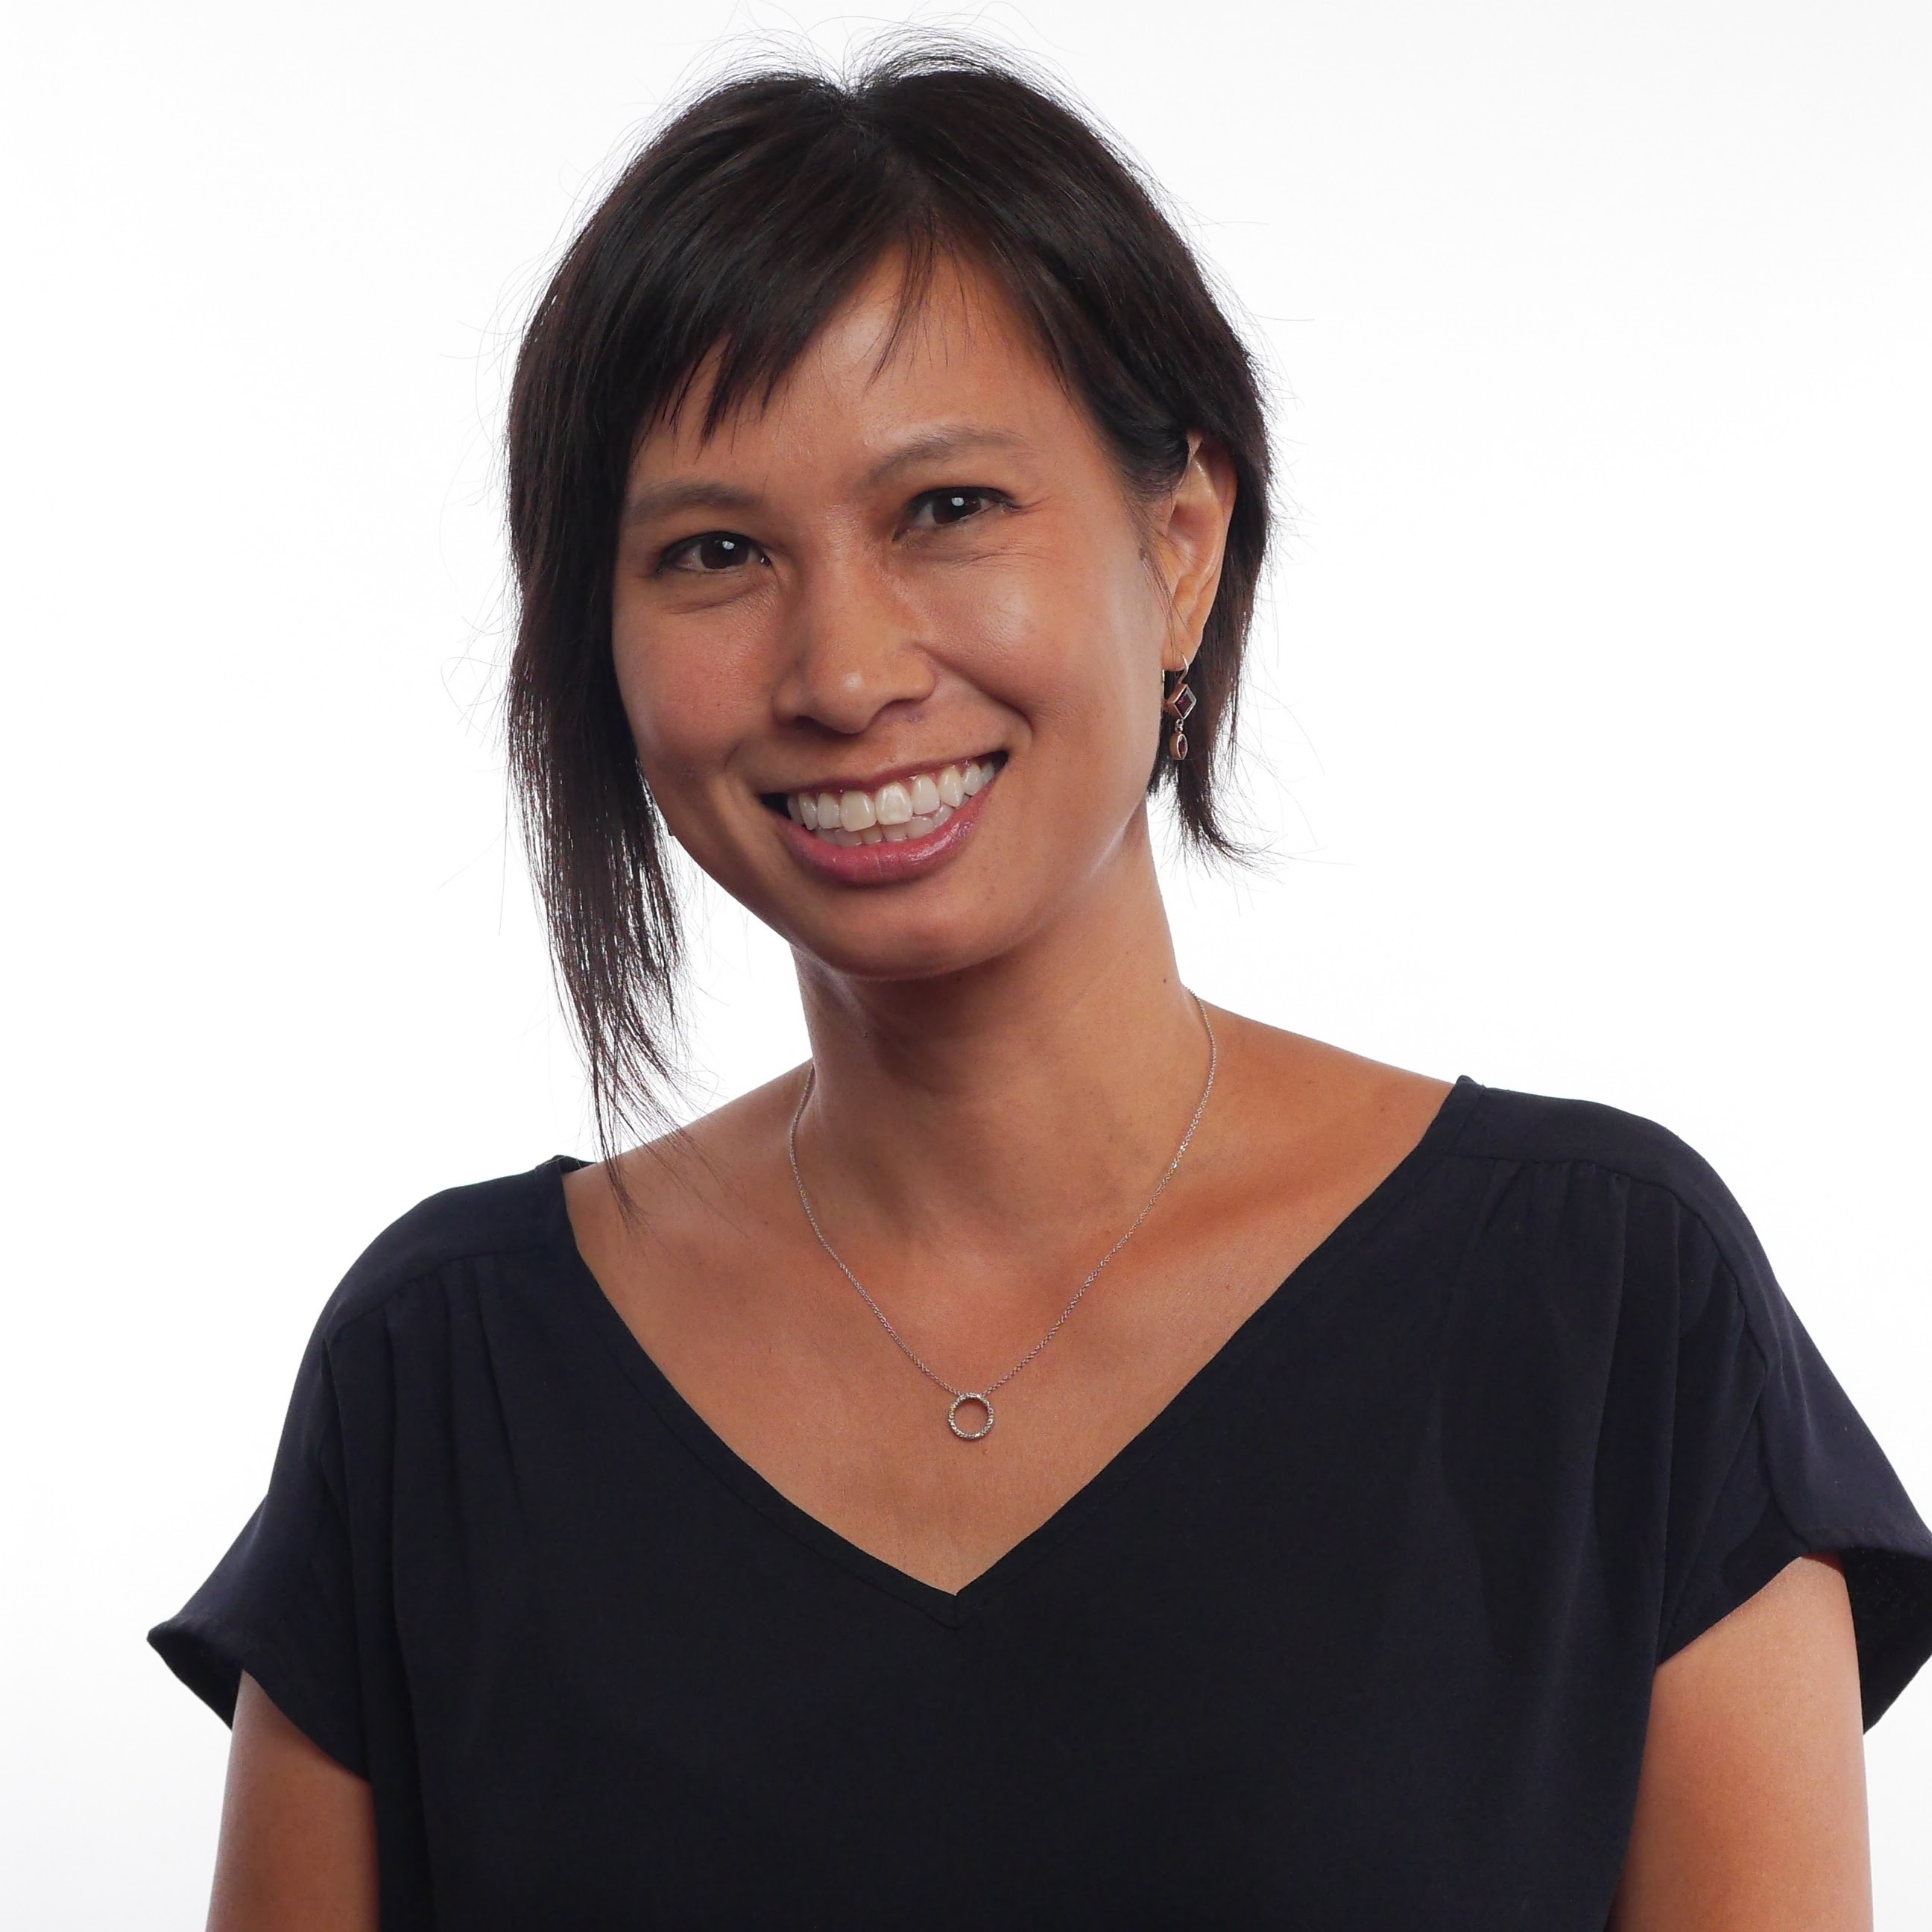 Christine Chun